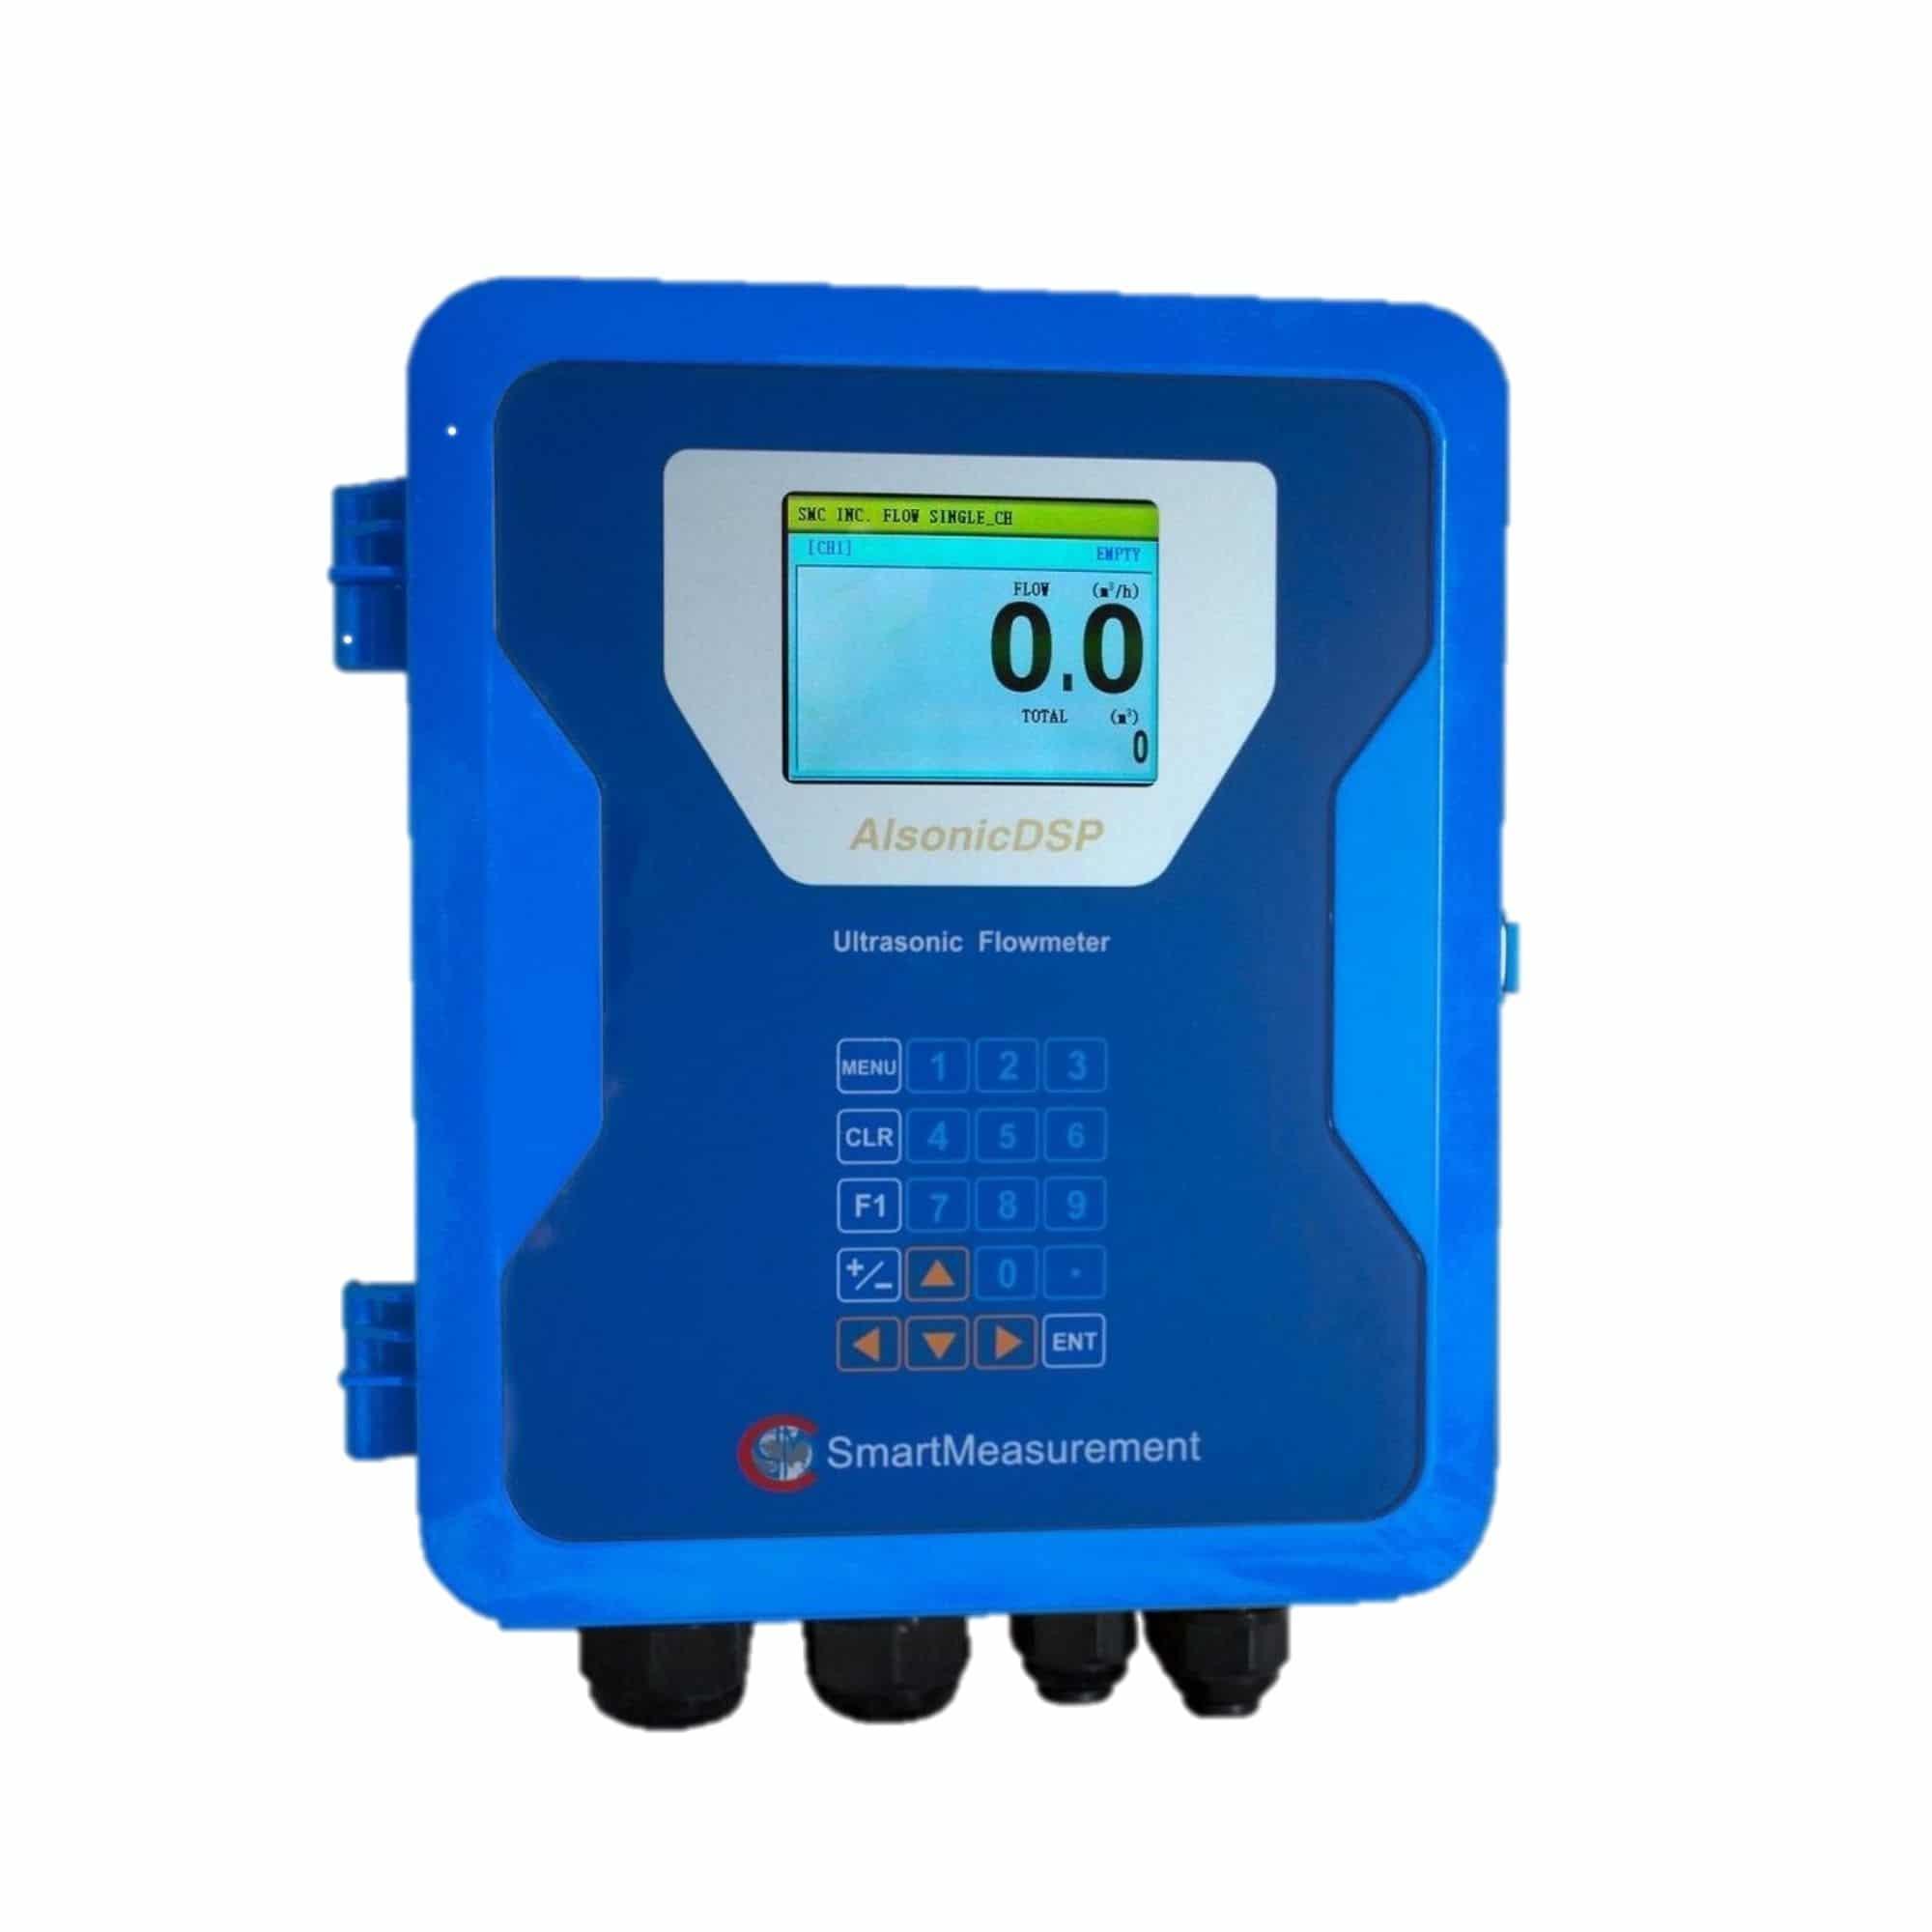 alsonic dsp flowmeter 1